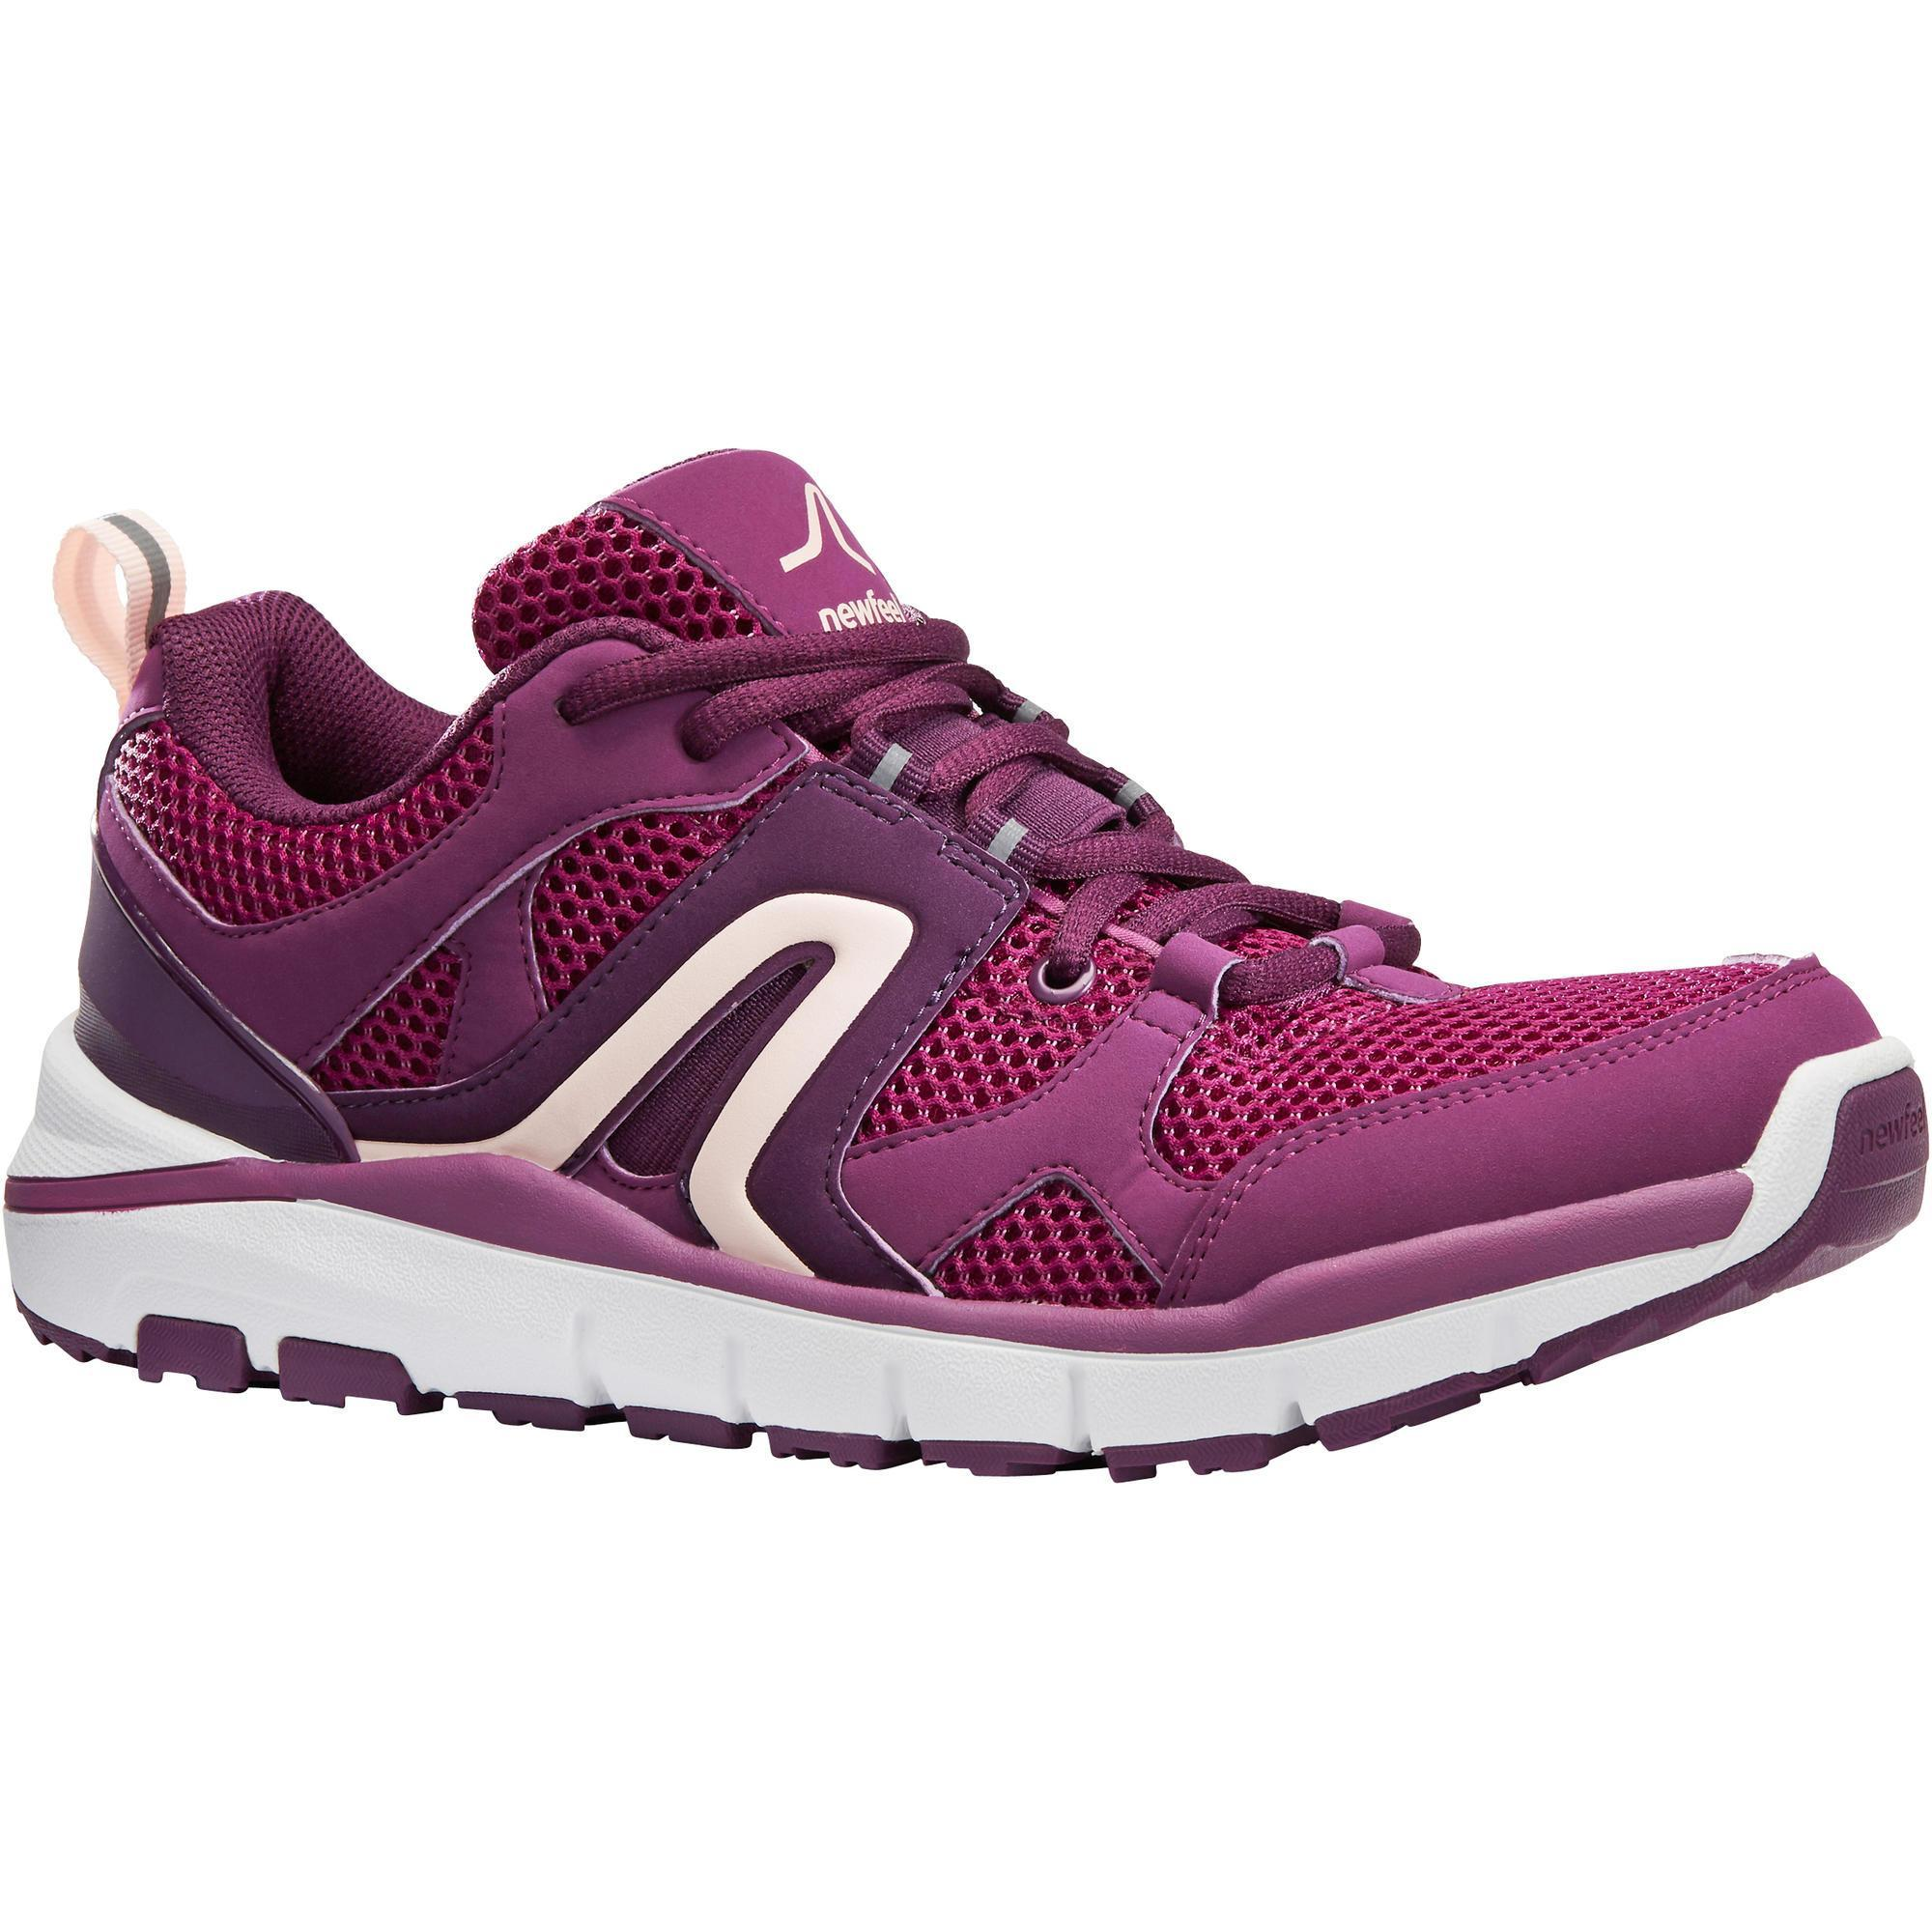 Walkingschuhe HW 500 Mesh Damen violett | Schuhe > Sportschuhe > Walkingschuhe | Violett | Newfeel